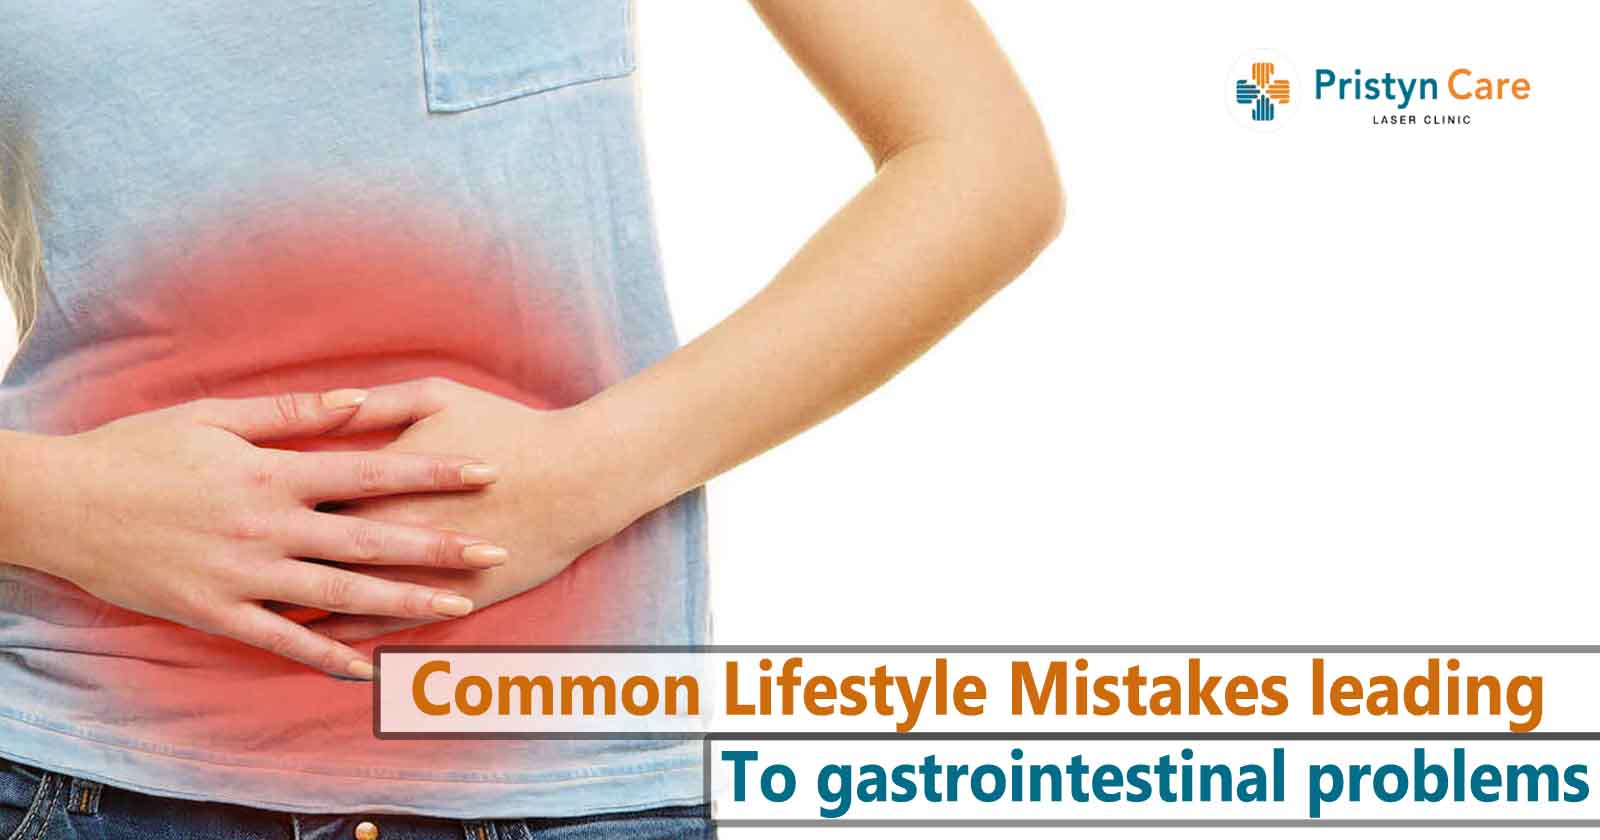 common-lifestyle-mistakes-leading-to-gastrointestinal-problems